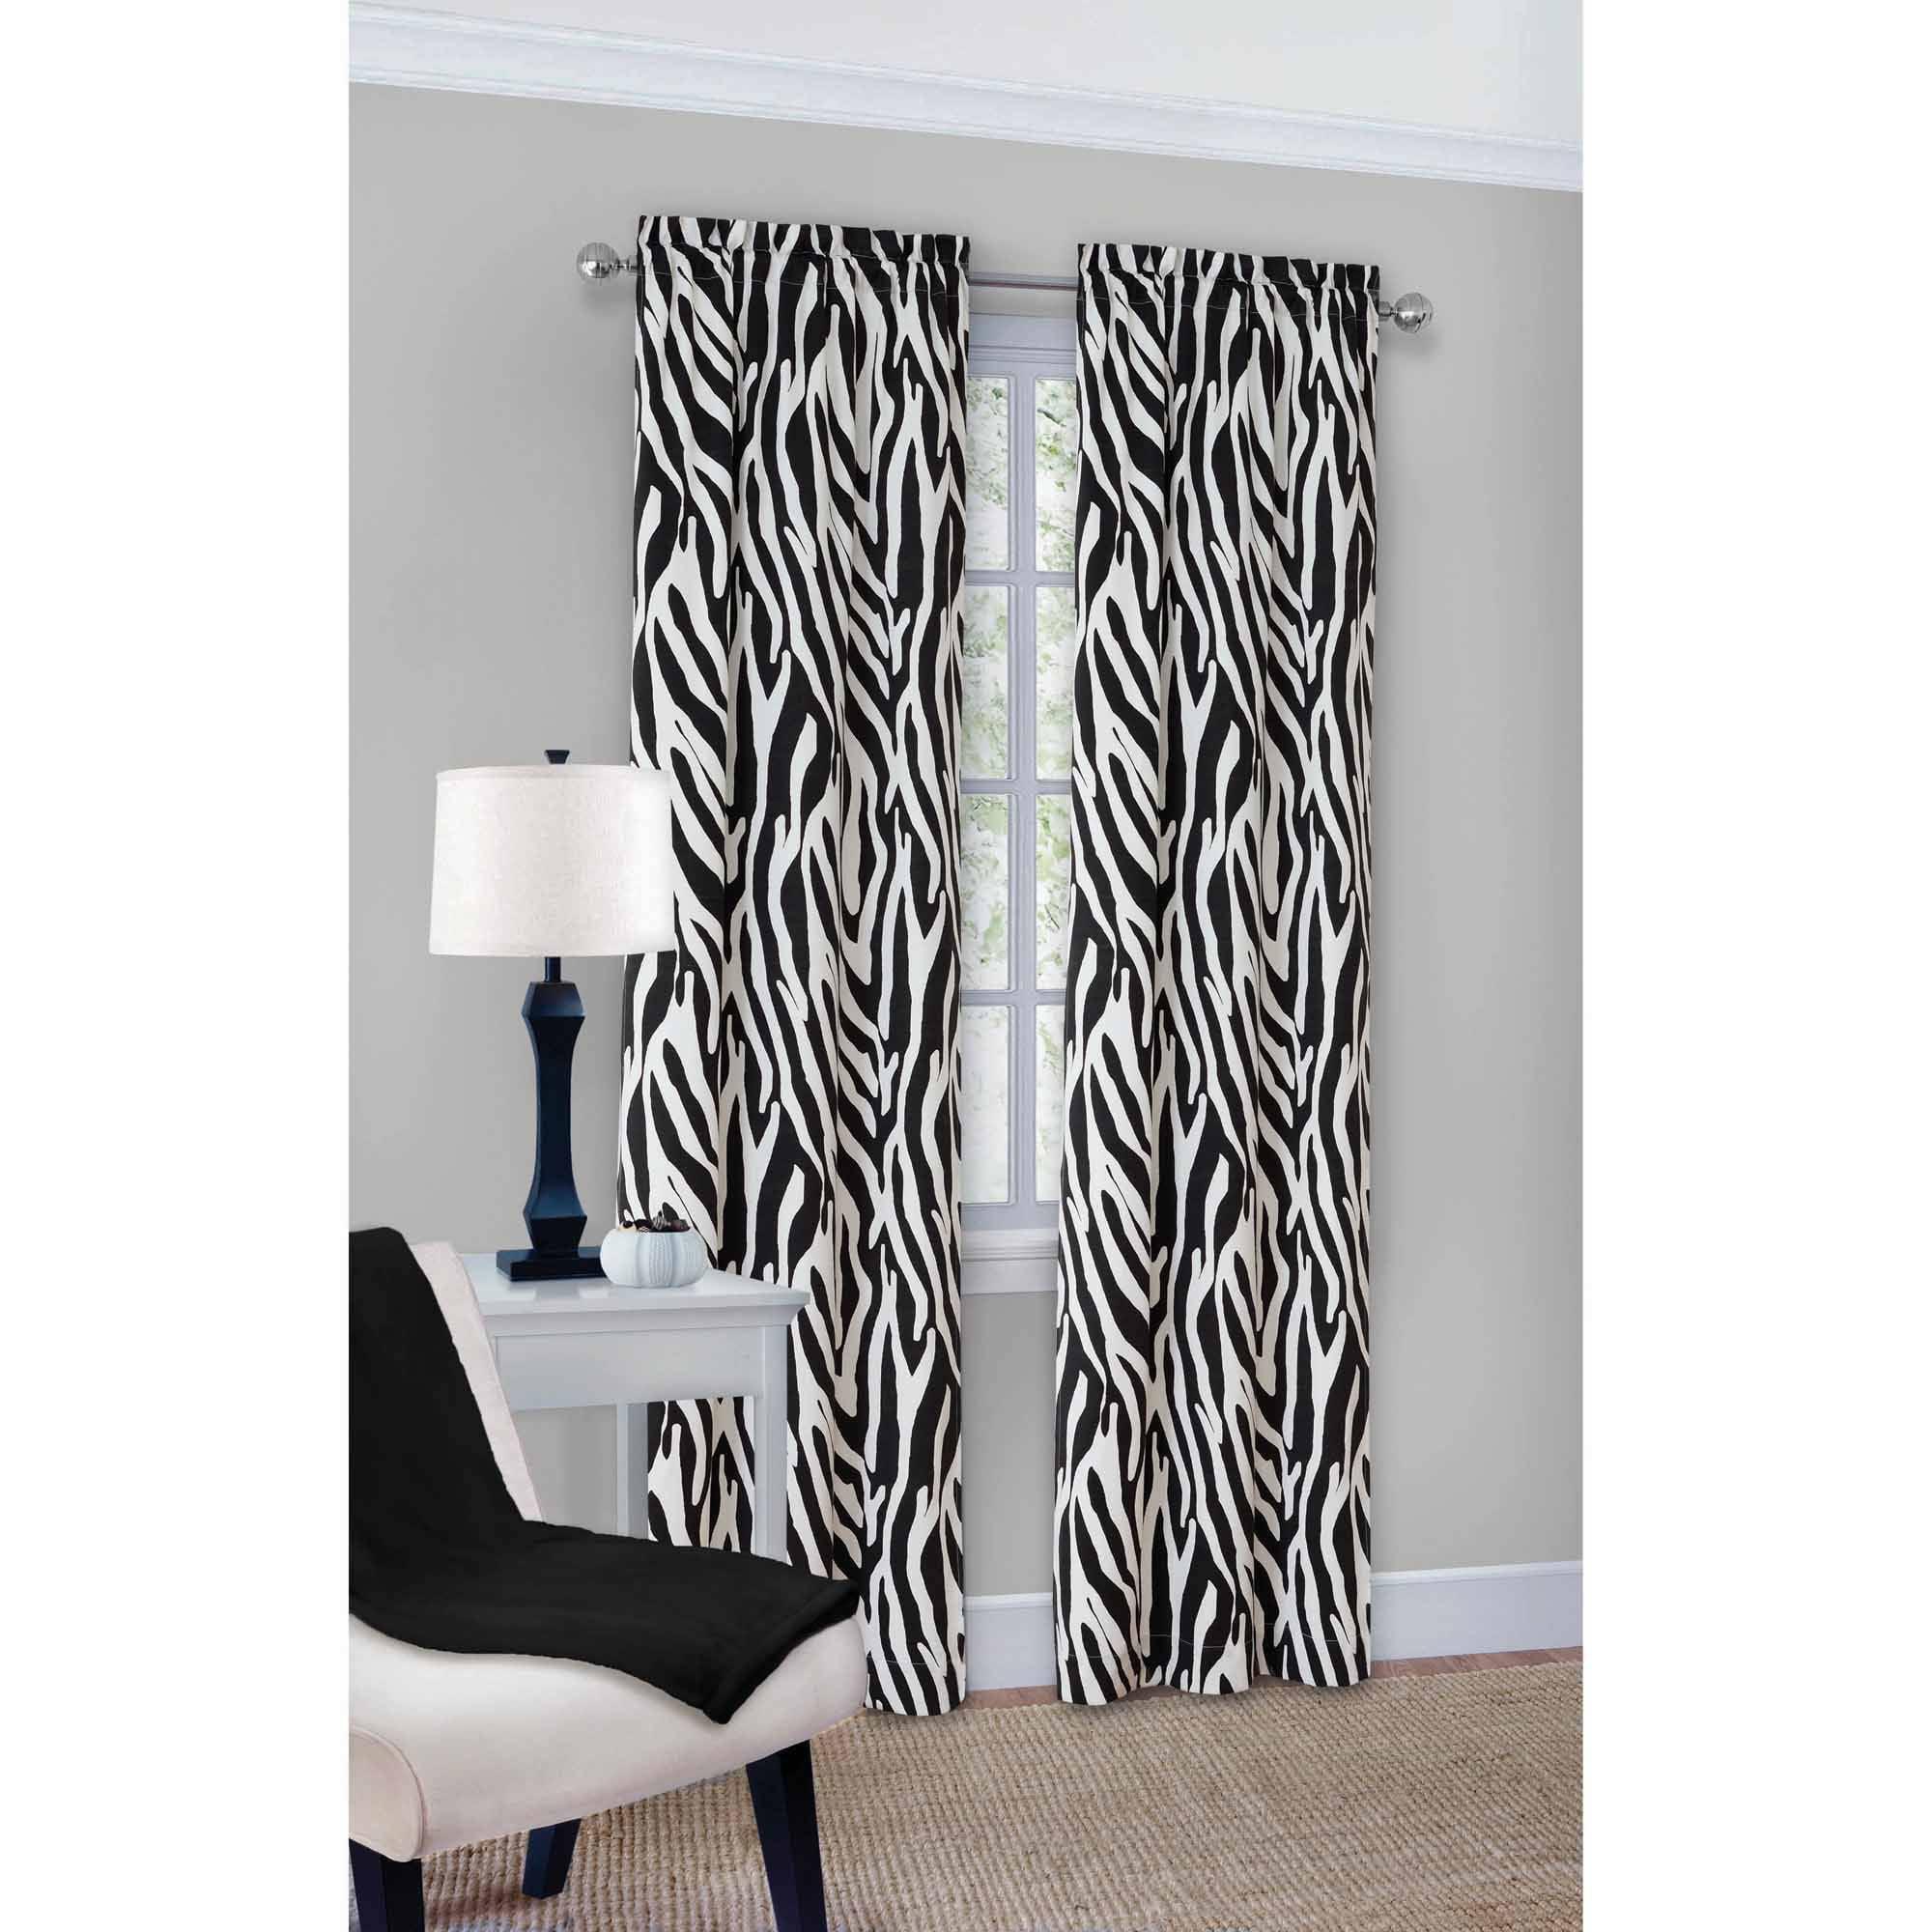 Mainstays Zebra Fashion Window Curtain Panels, Set of 2